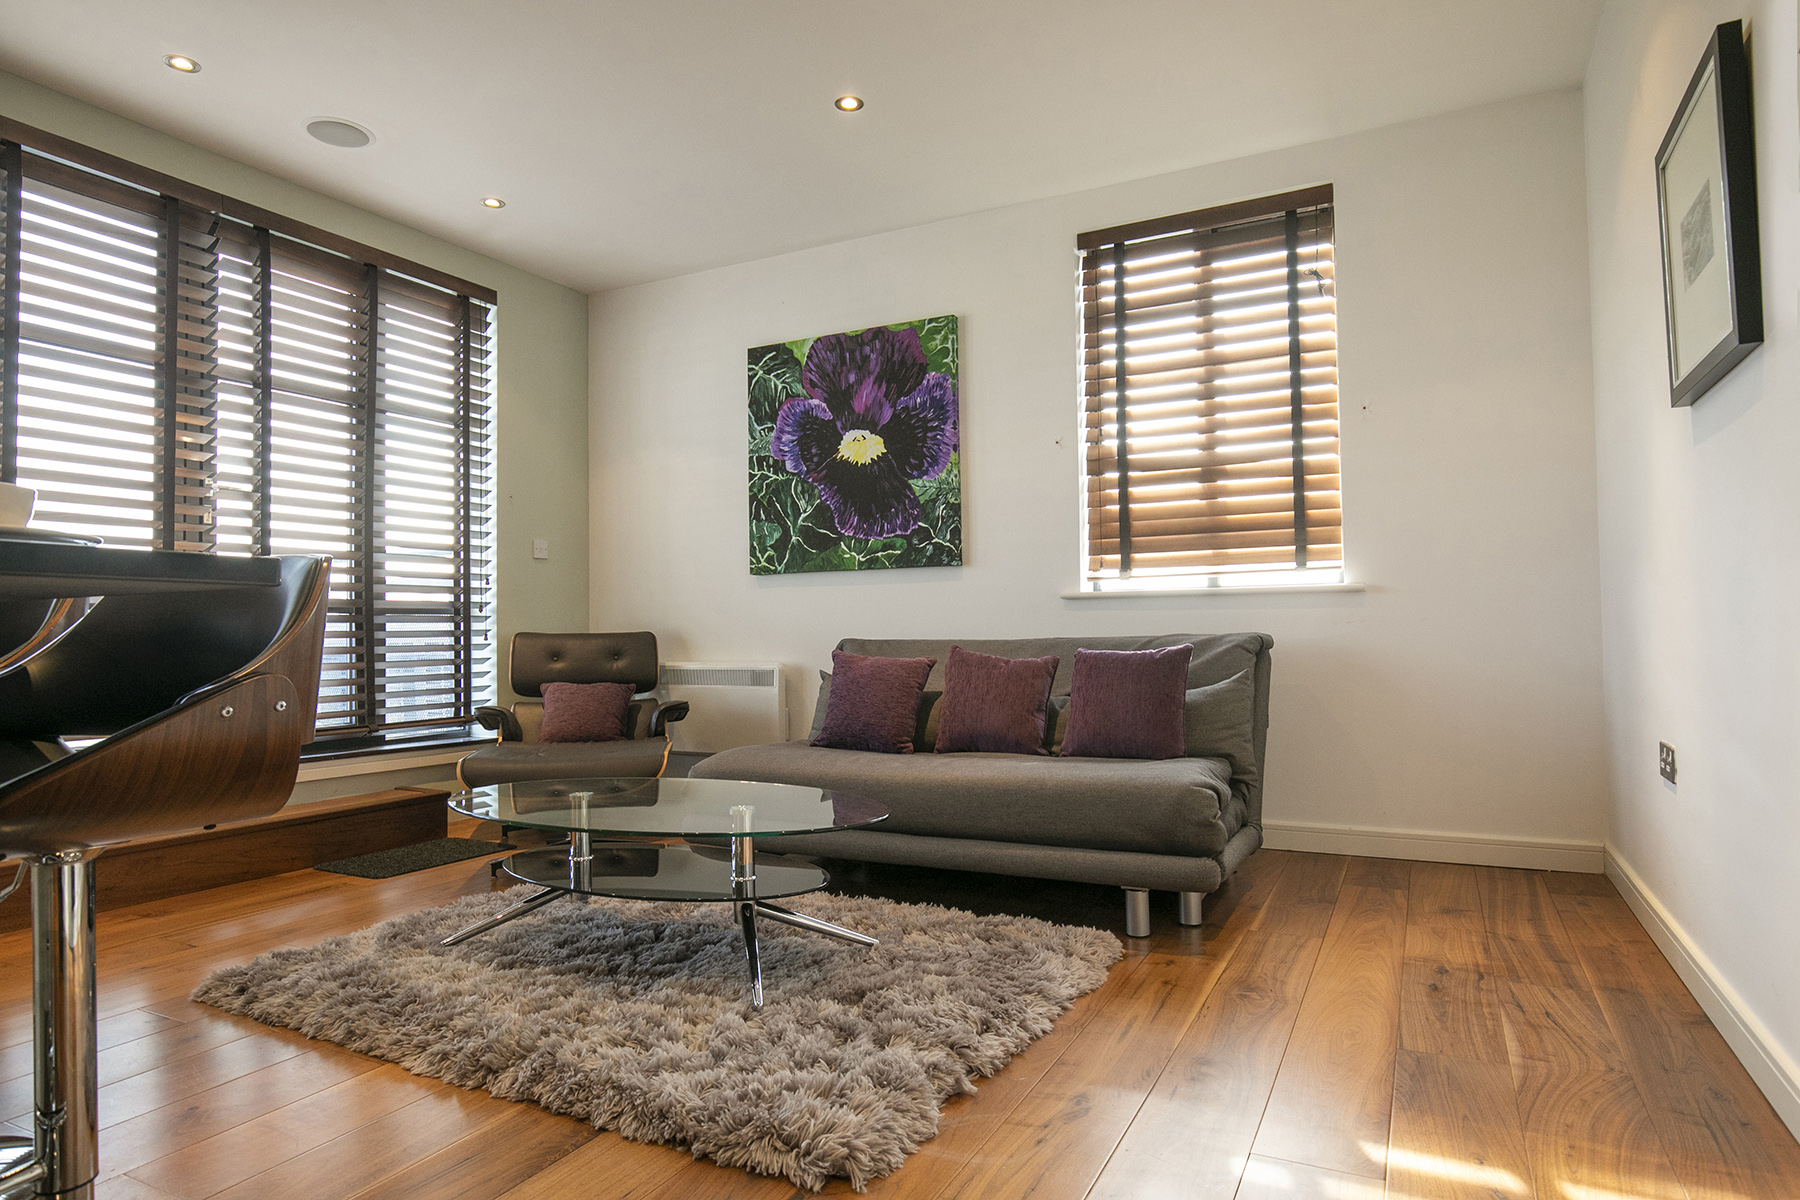 Rug at Wallis Square Apartments, Centre, Farnborough - Citybase Apartments